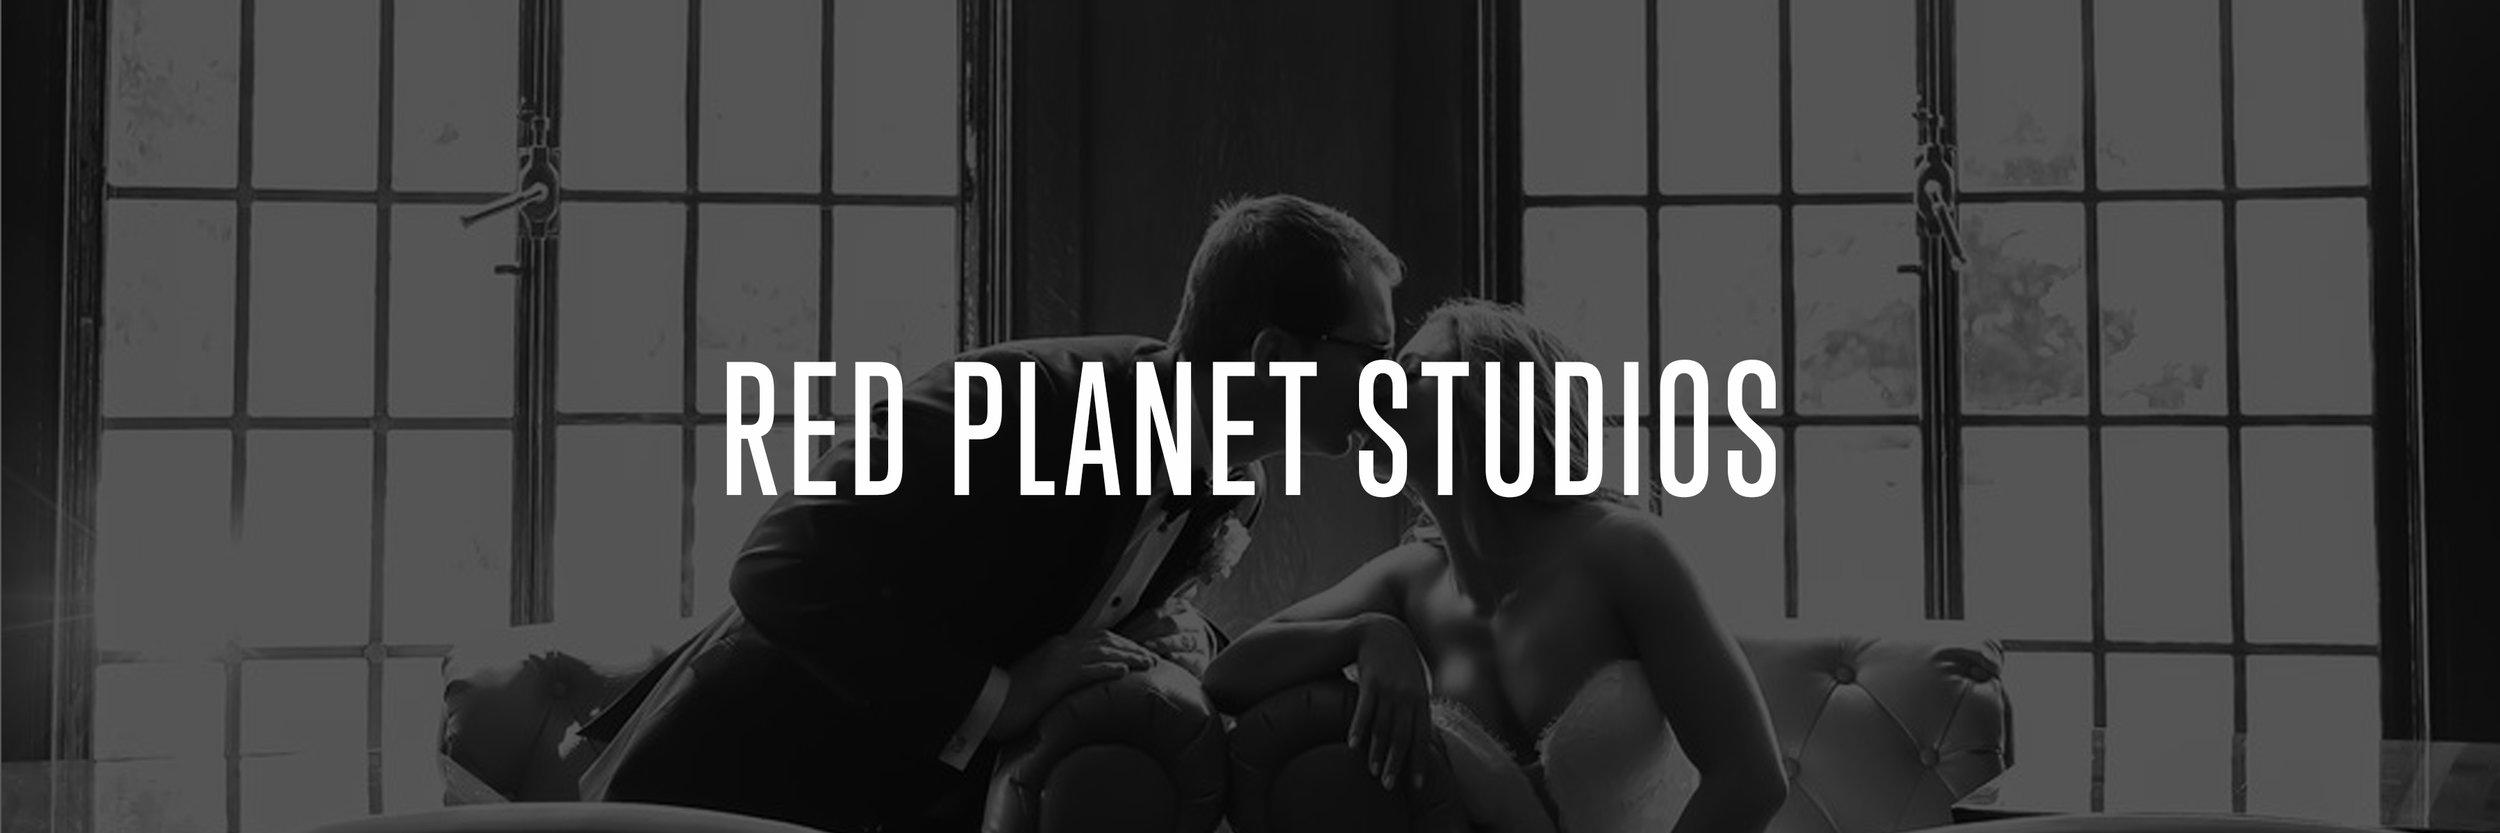 RedplanetStudios.jpg